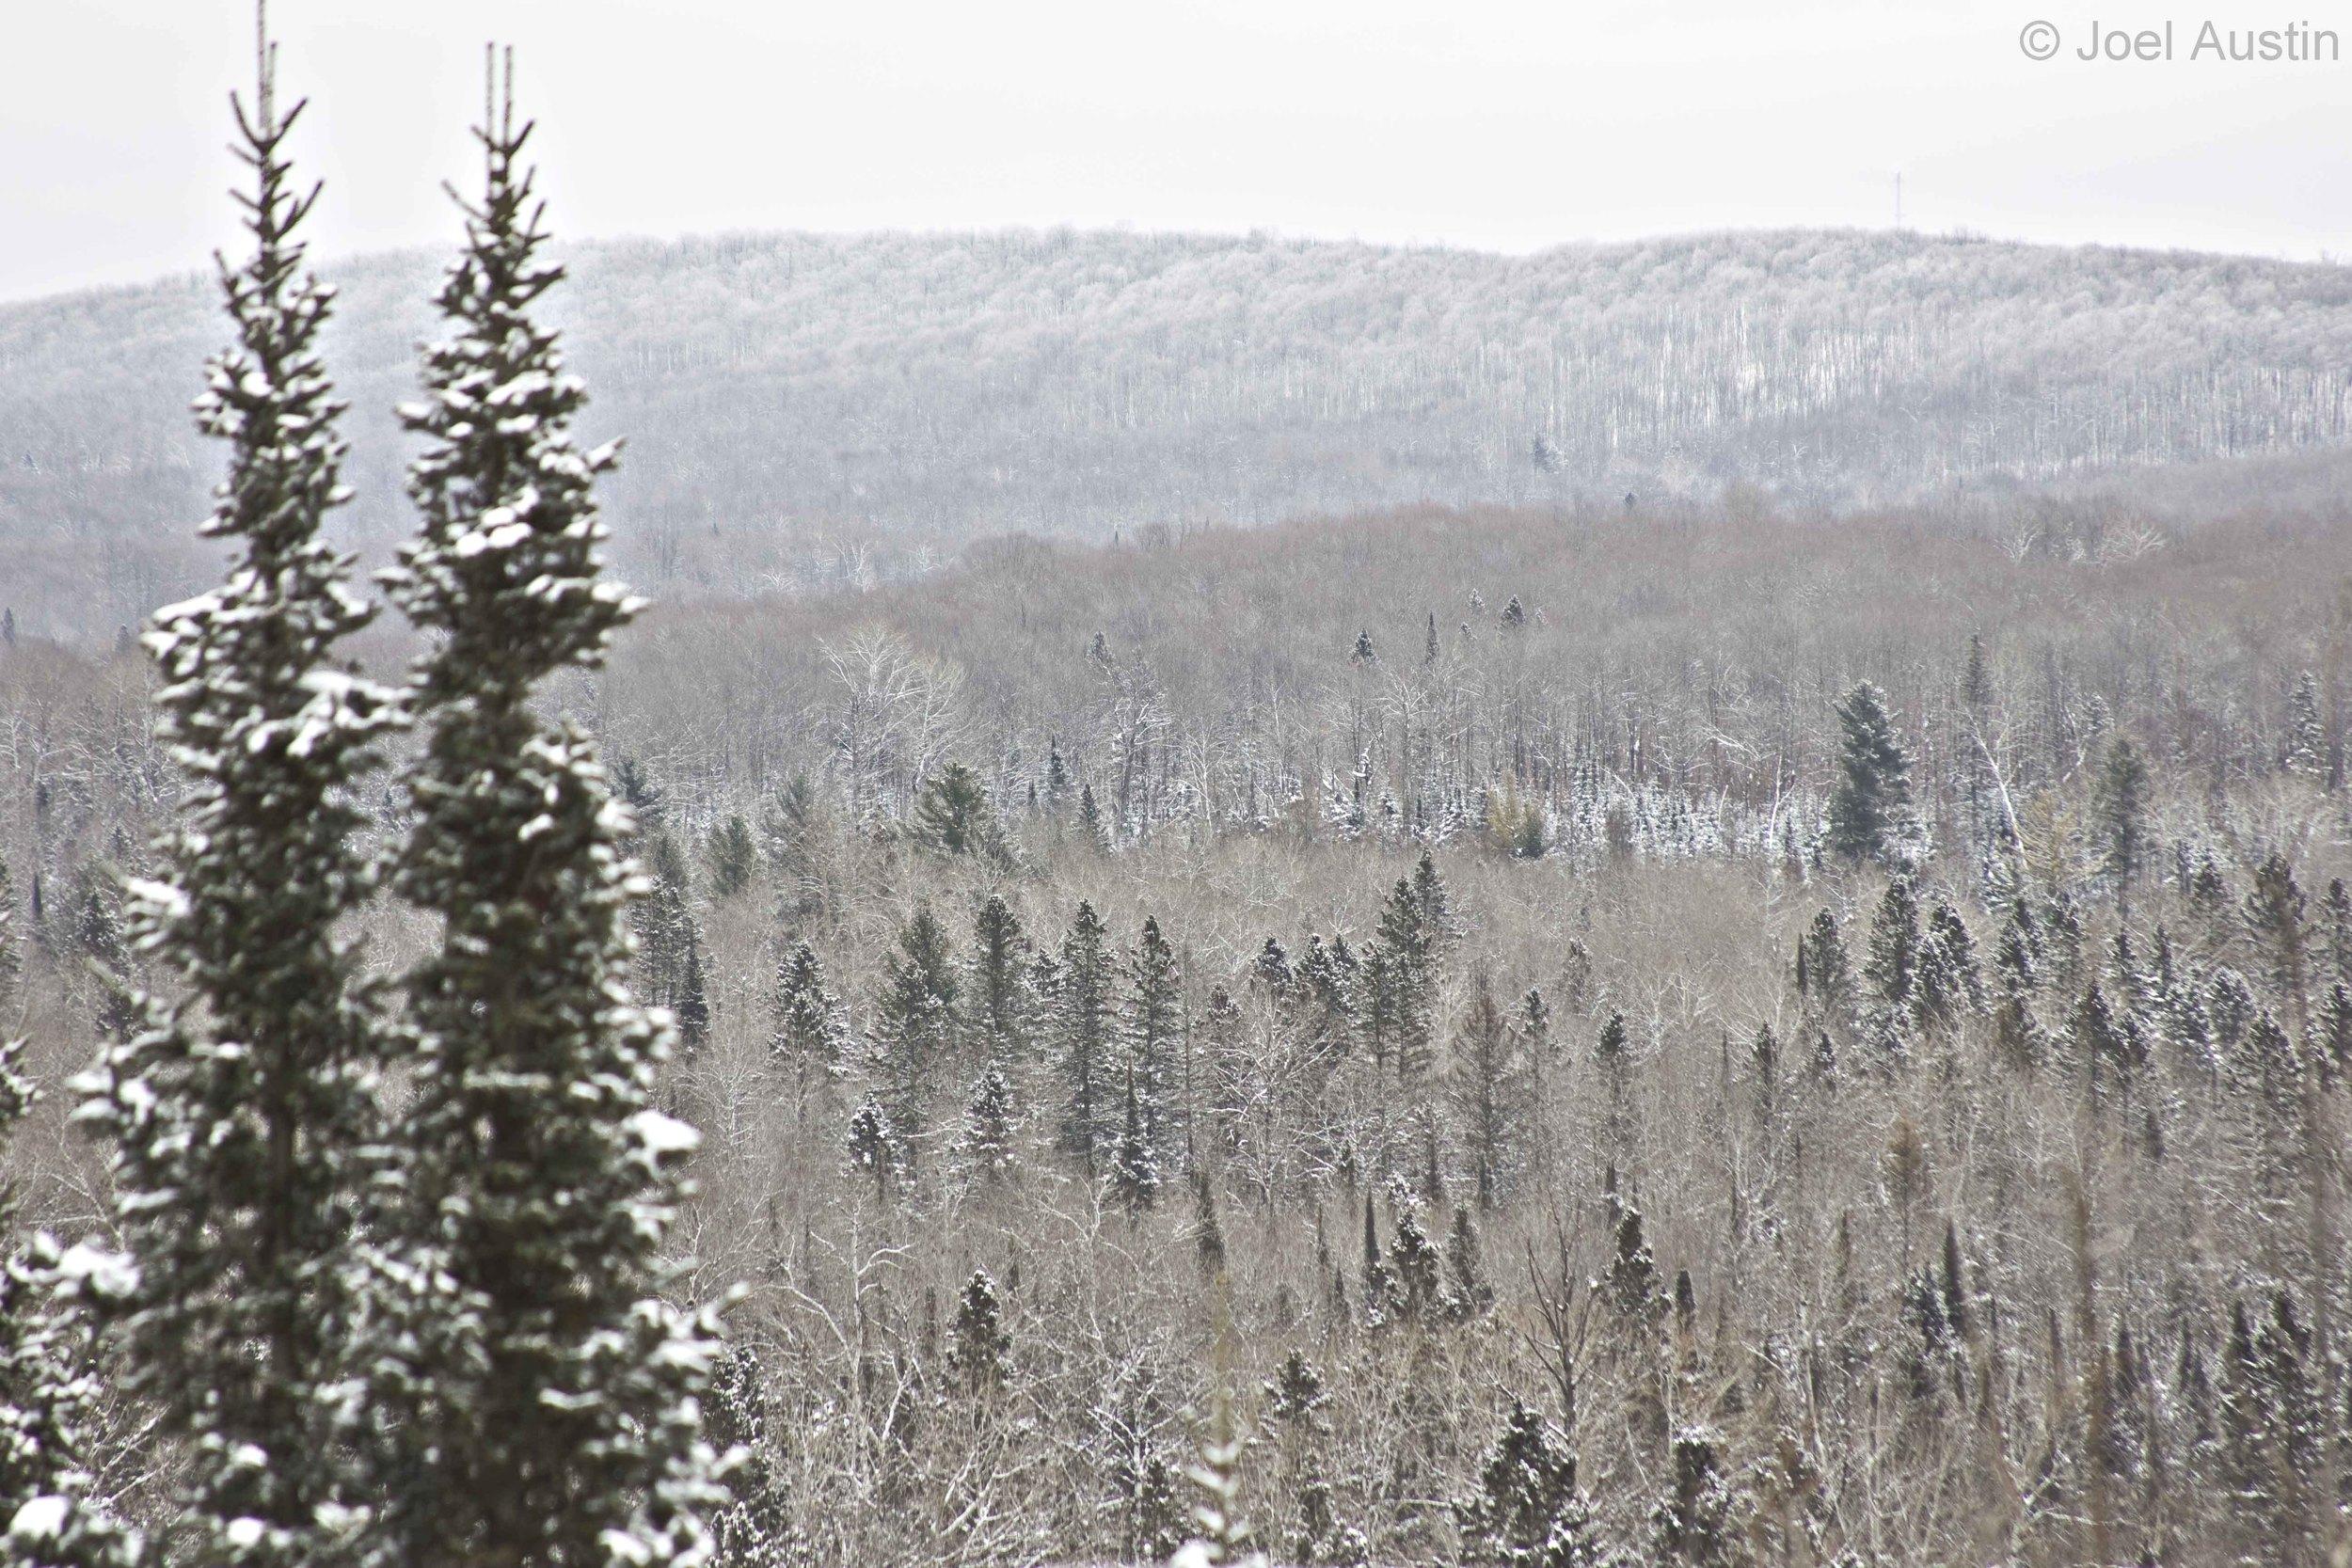 Wintery scene from Penokee Overlook